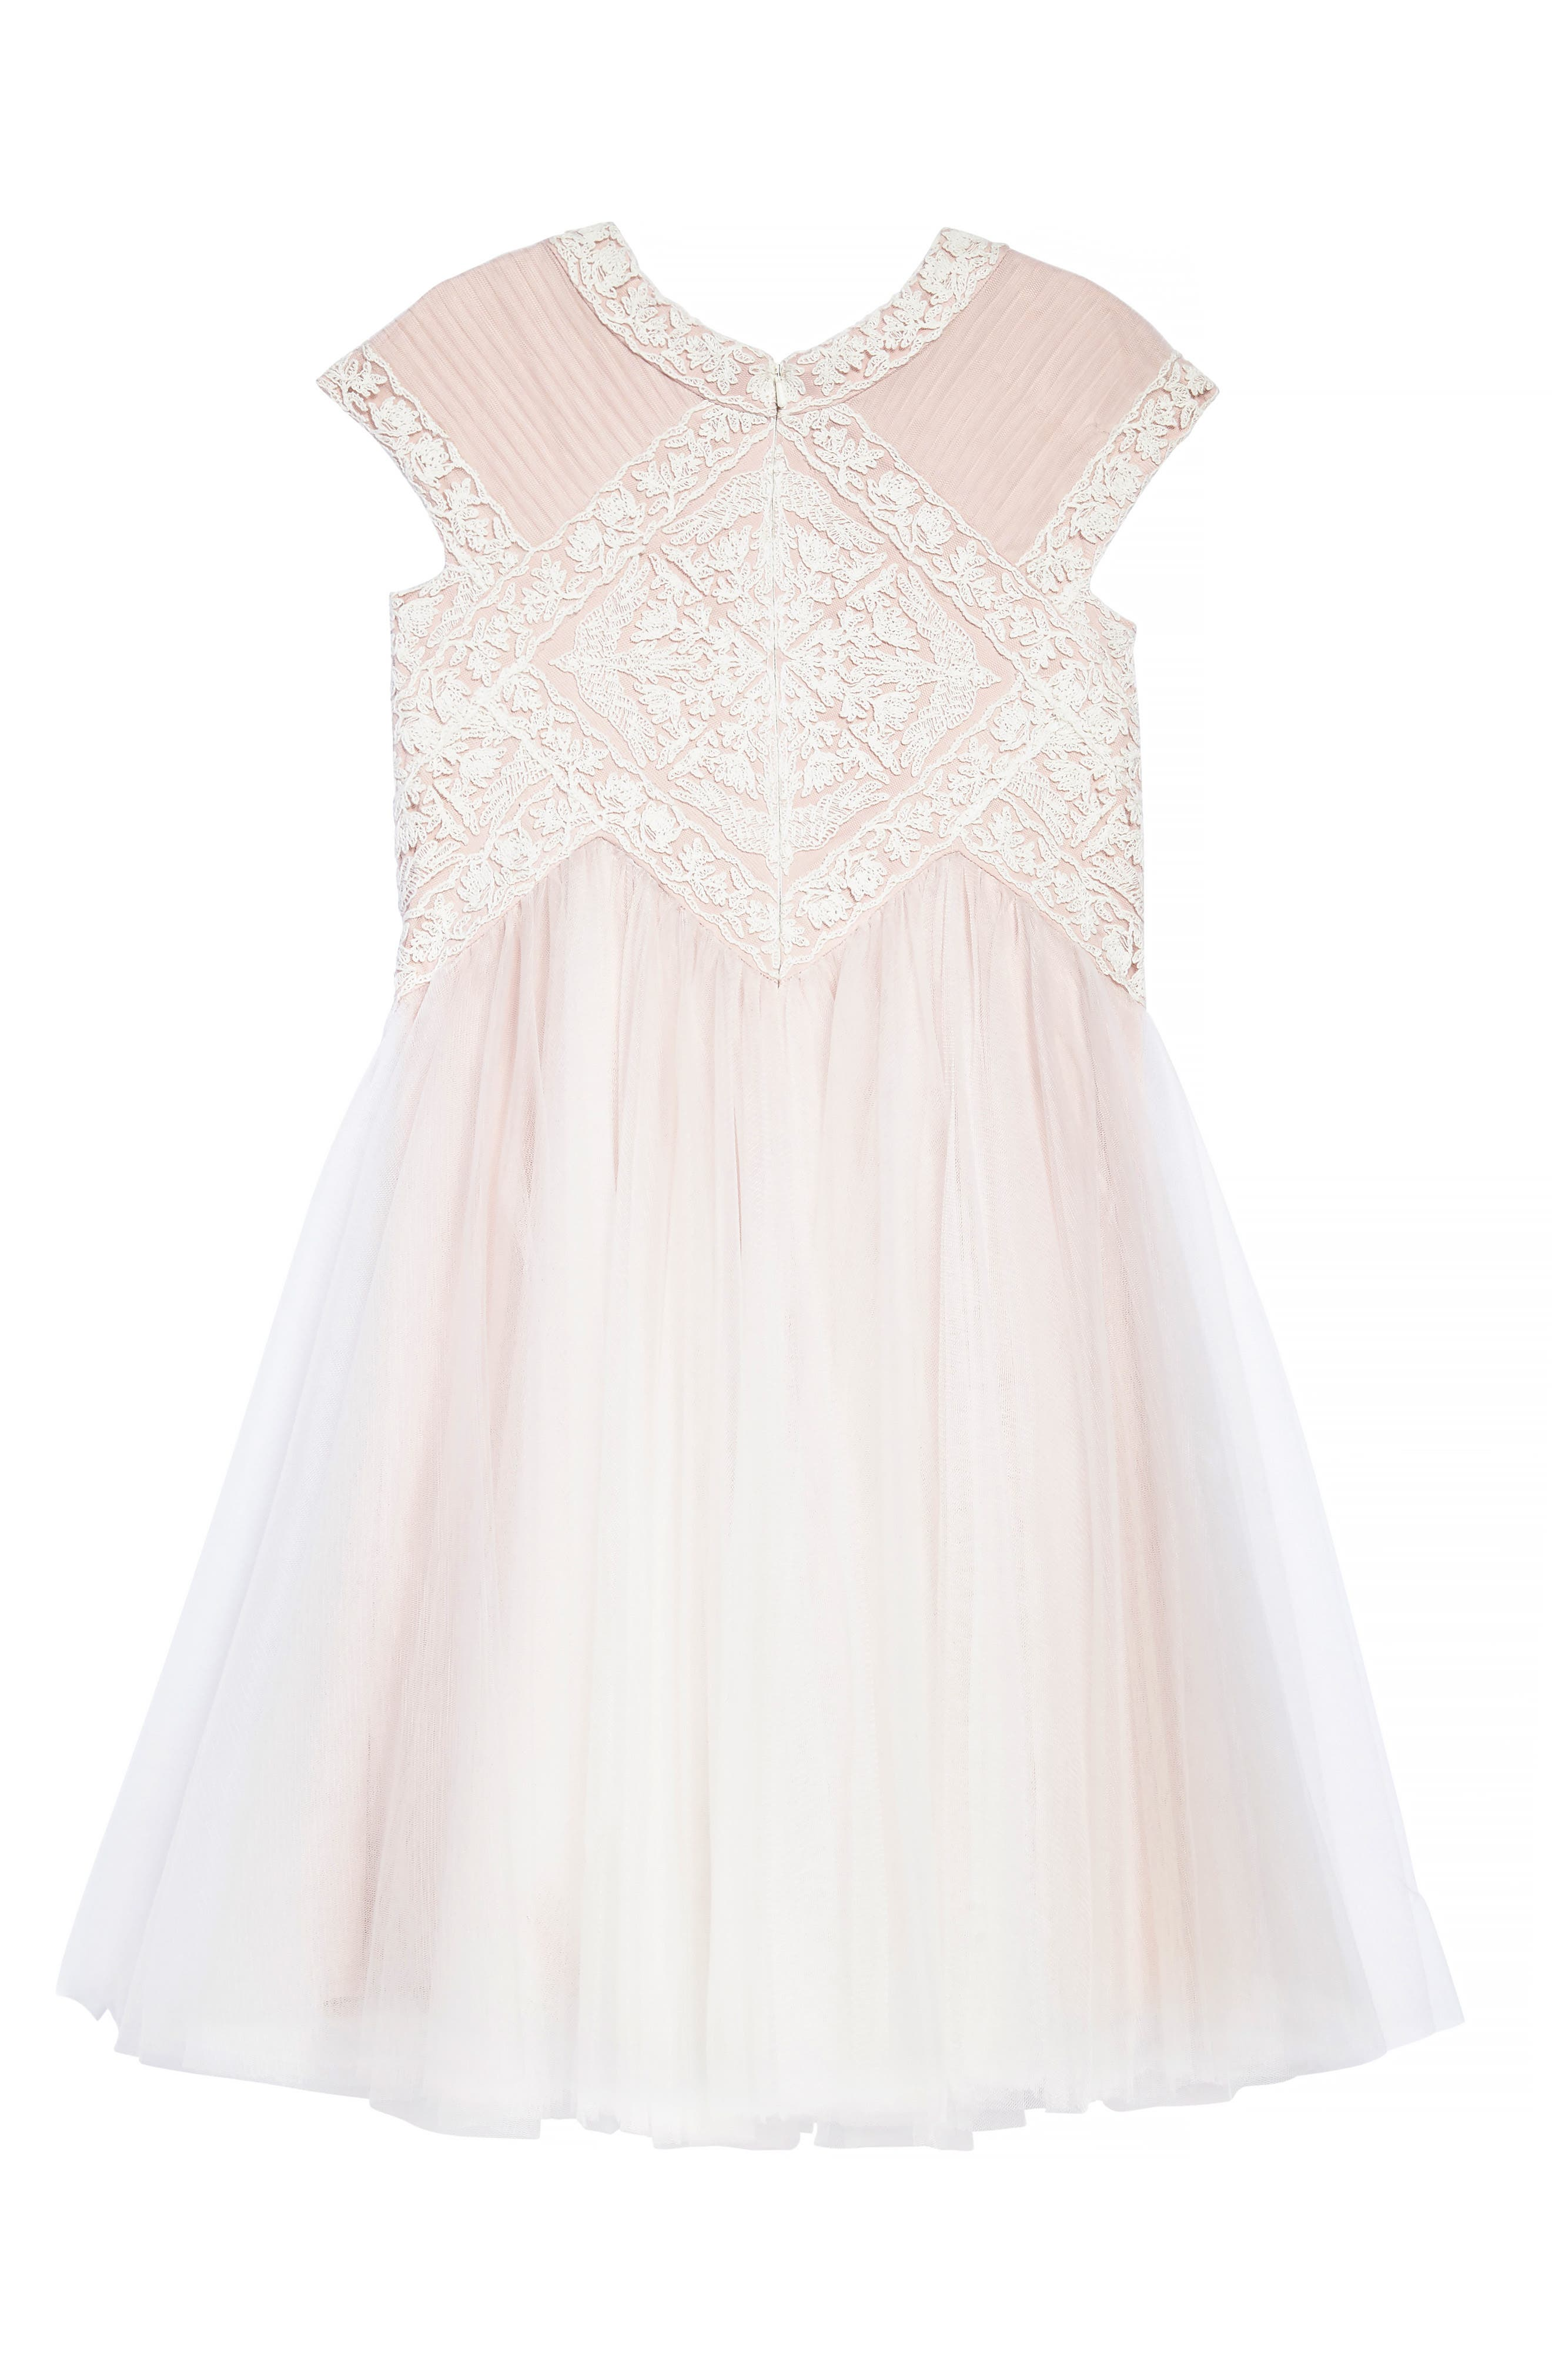 Lace Tulle Dress,                             Alternate thumbnail 2, color,                             Ivory/ Primrose